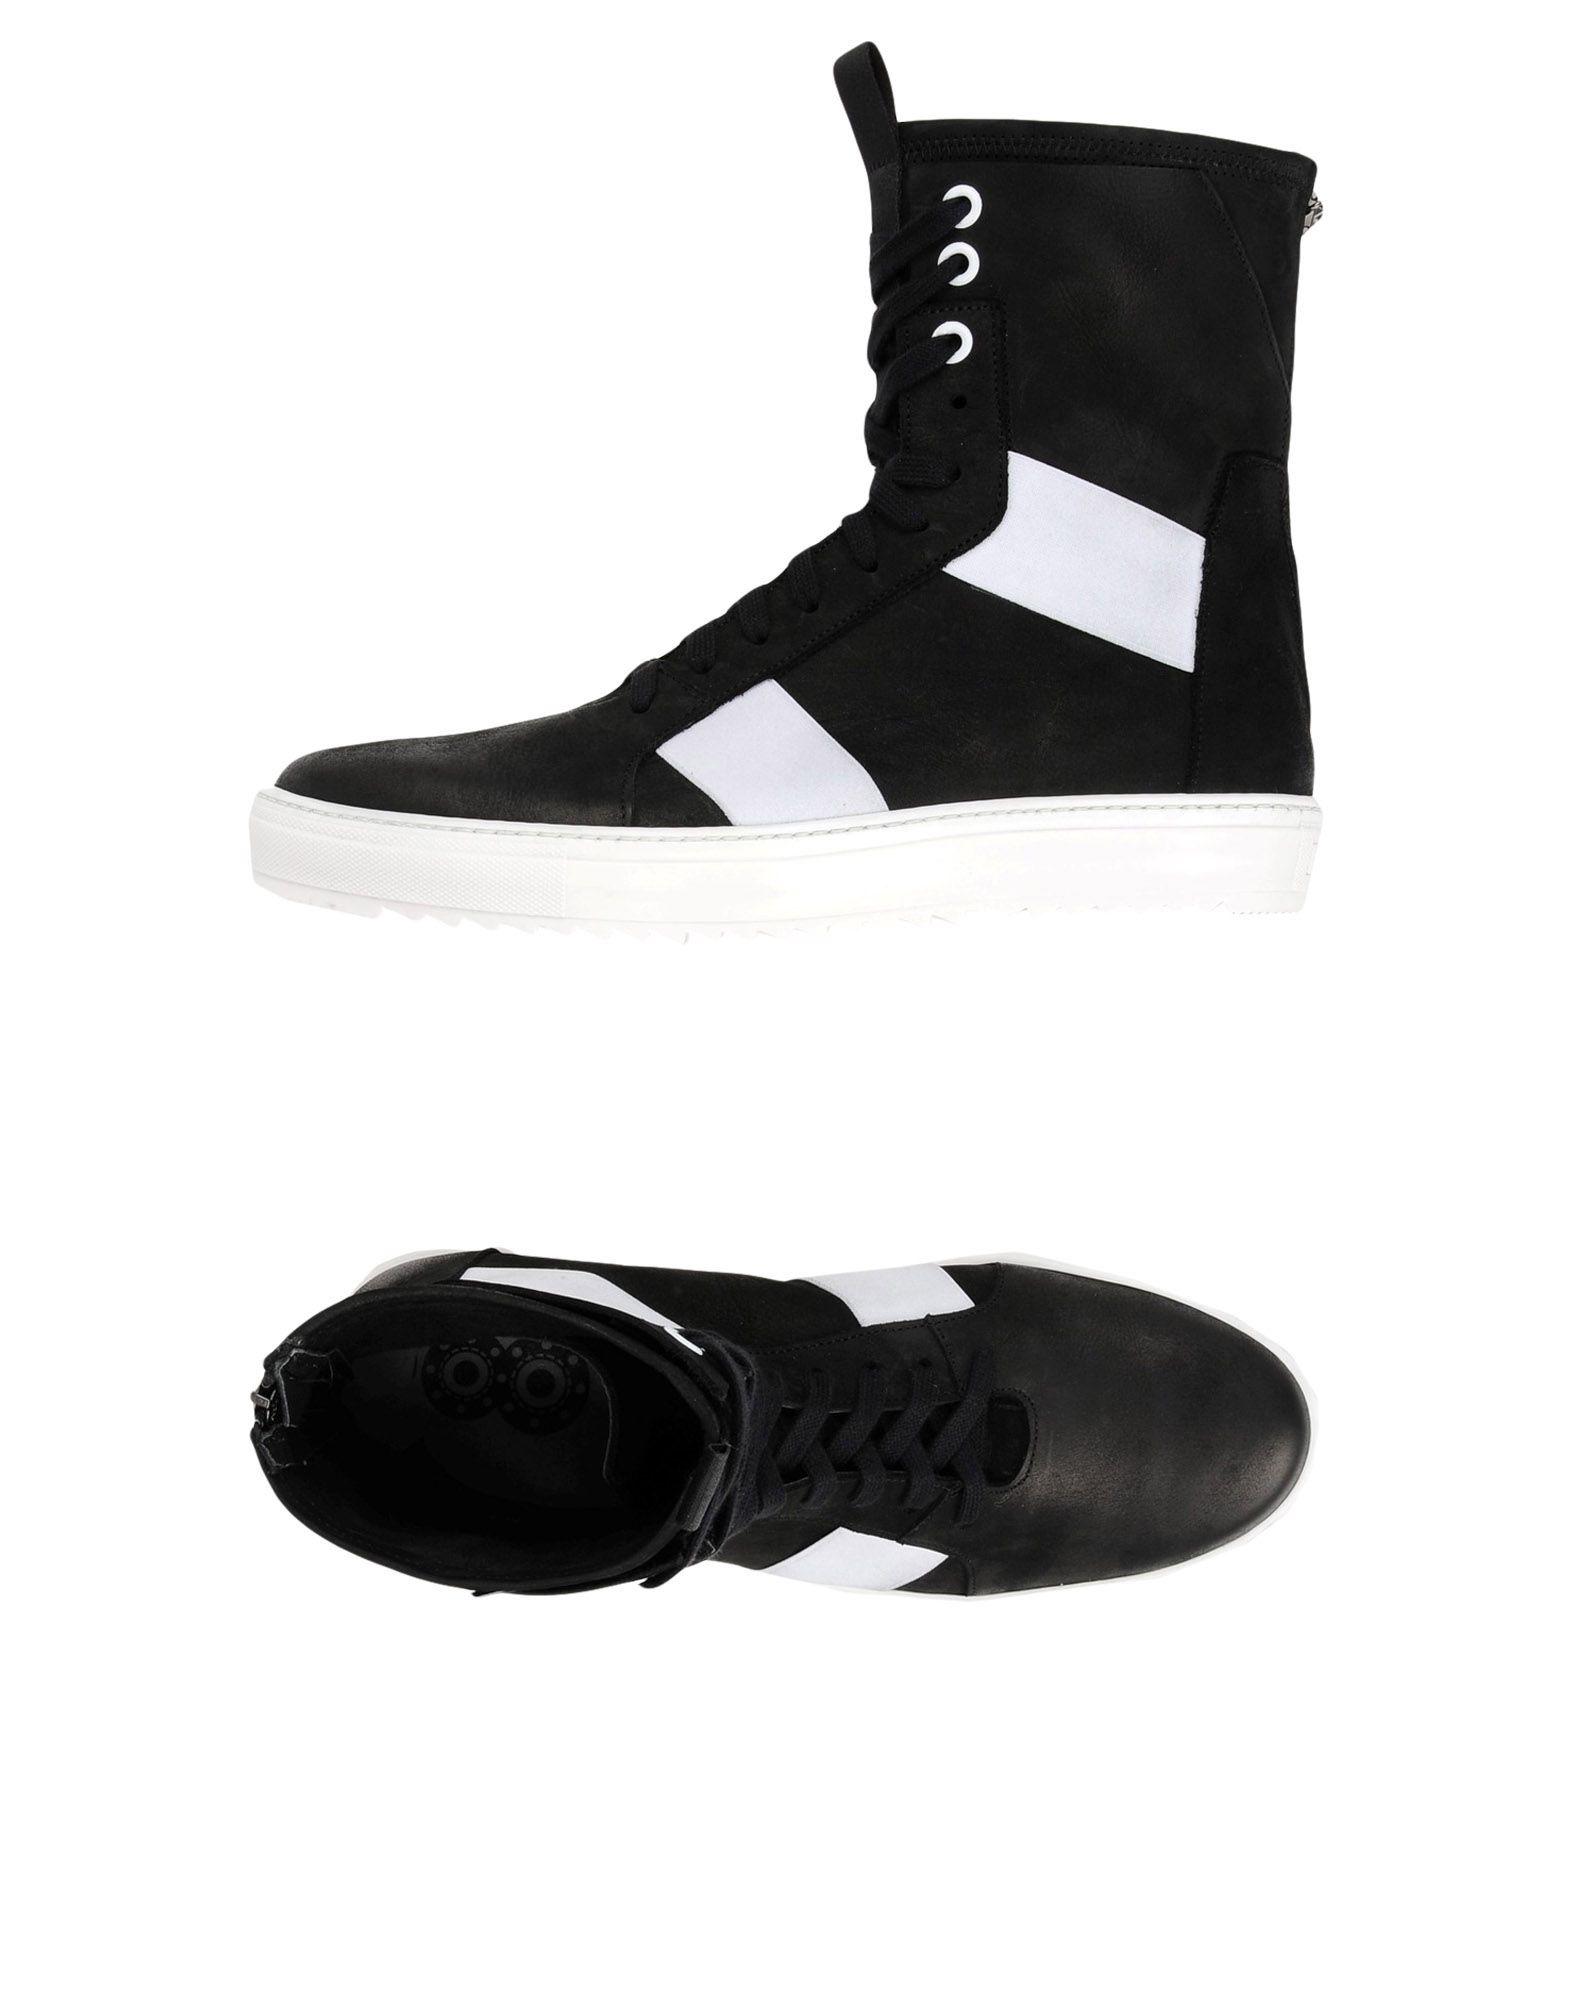 8 Herren High Sneakers & Tennisschuhe Farbe Schwarz Größe 9